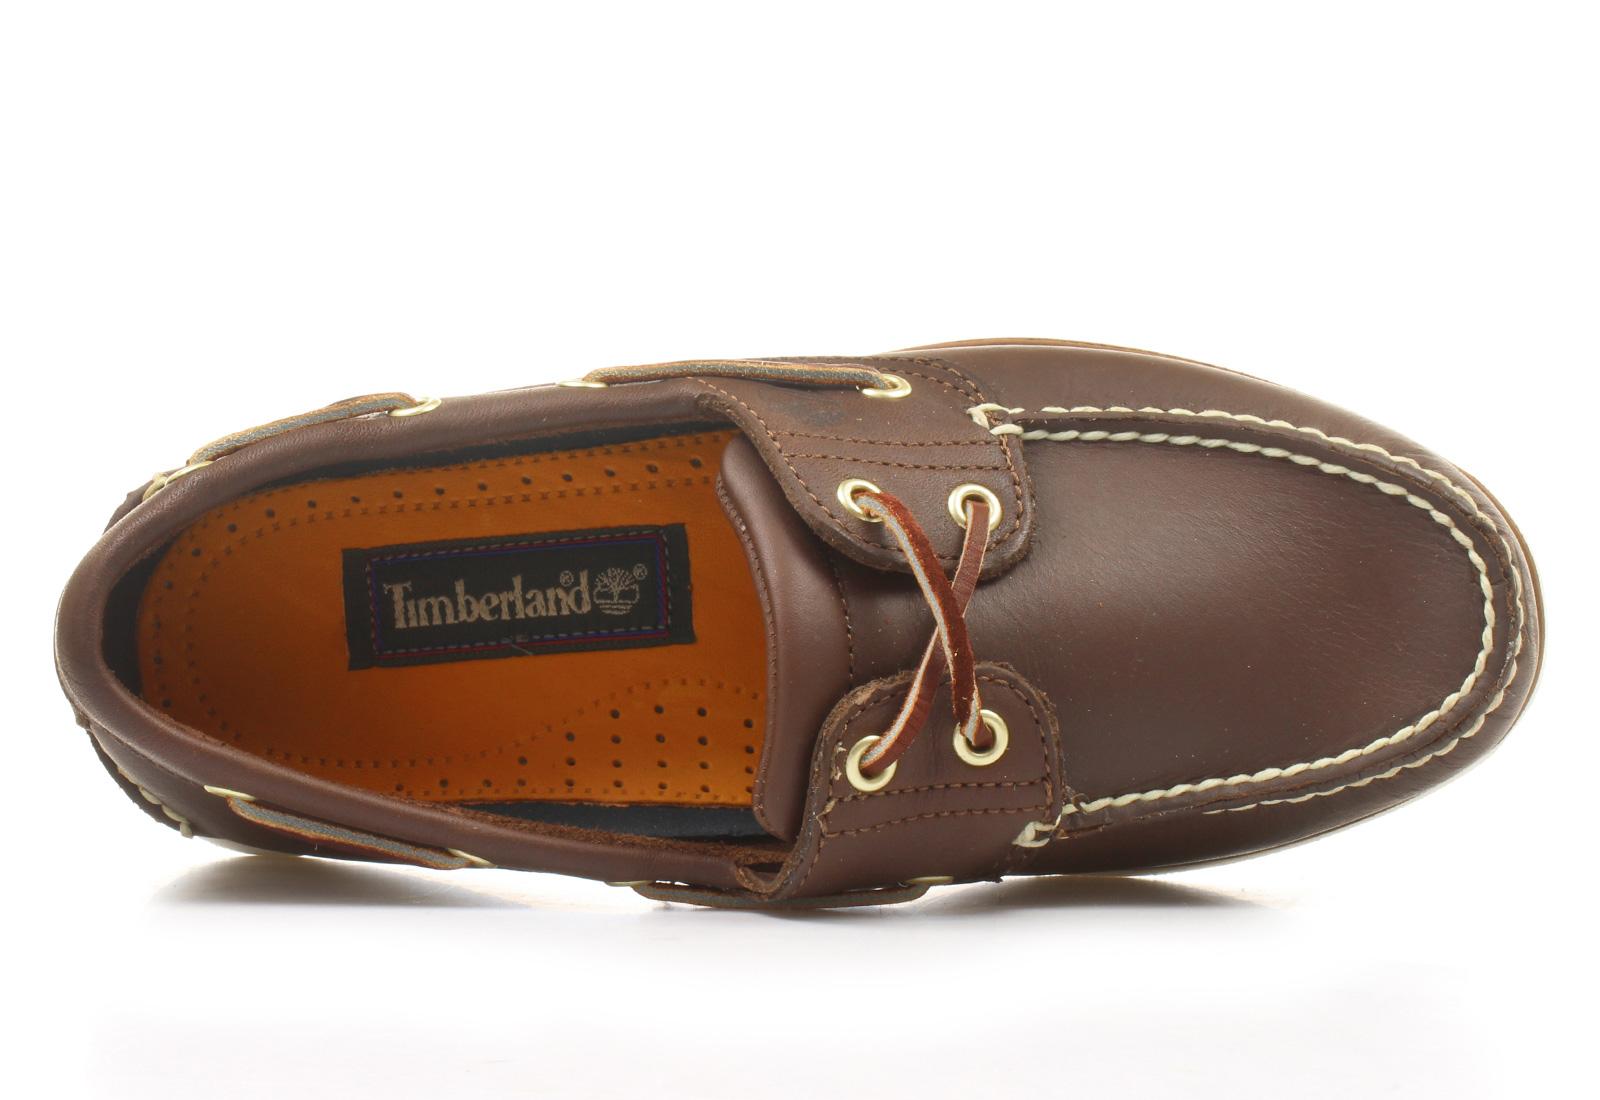 62c2594b1580 Timberland Cipő - Classic Boat - 74035-brn - Office Shoes Magyarország